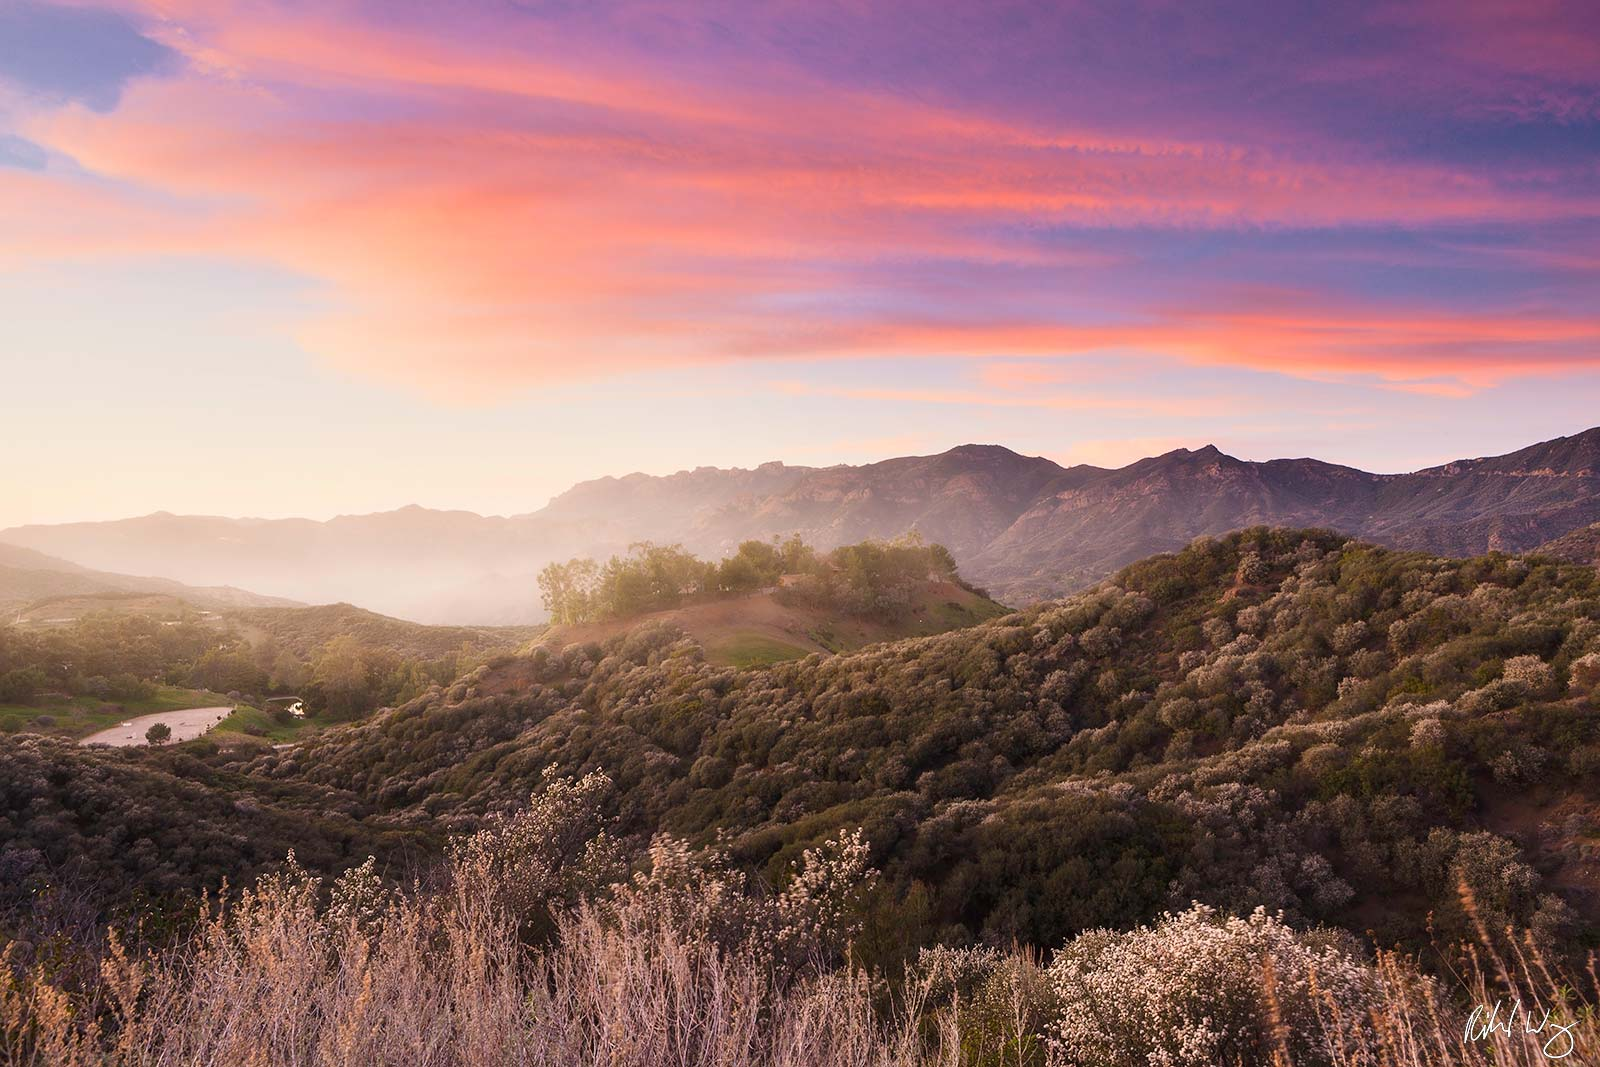 Sunset, Santa Monica Mountains National Recreation Area, California, photo, photo